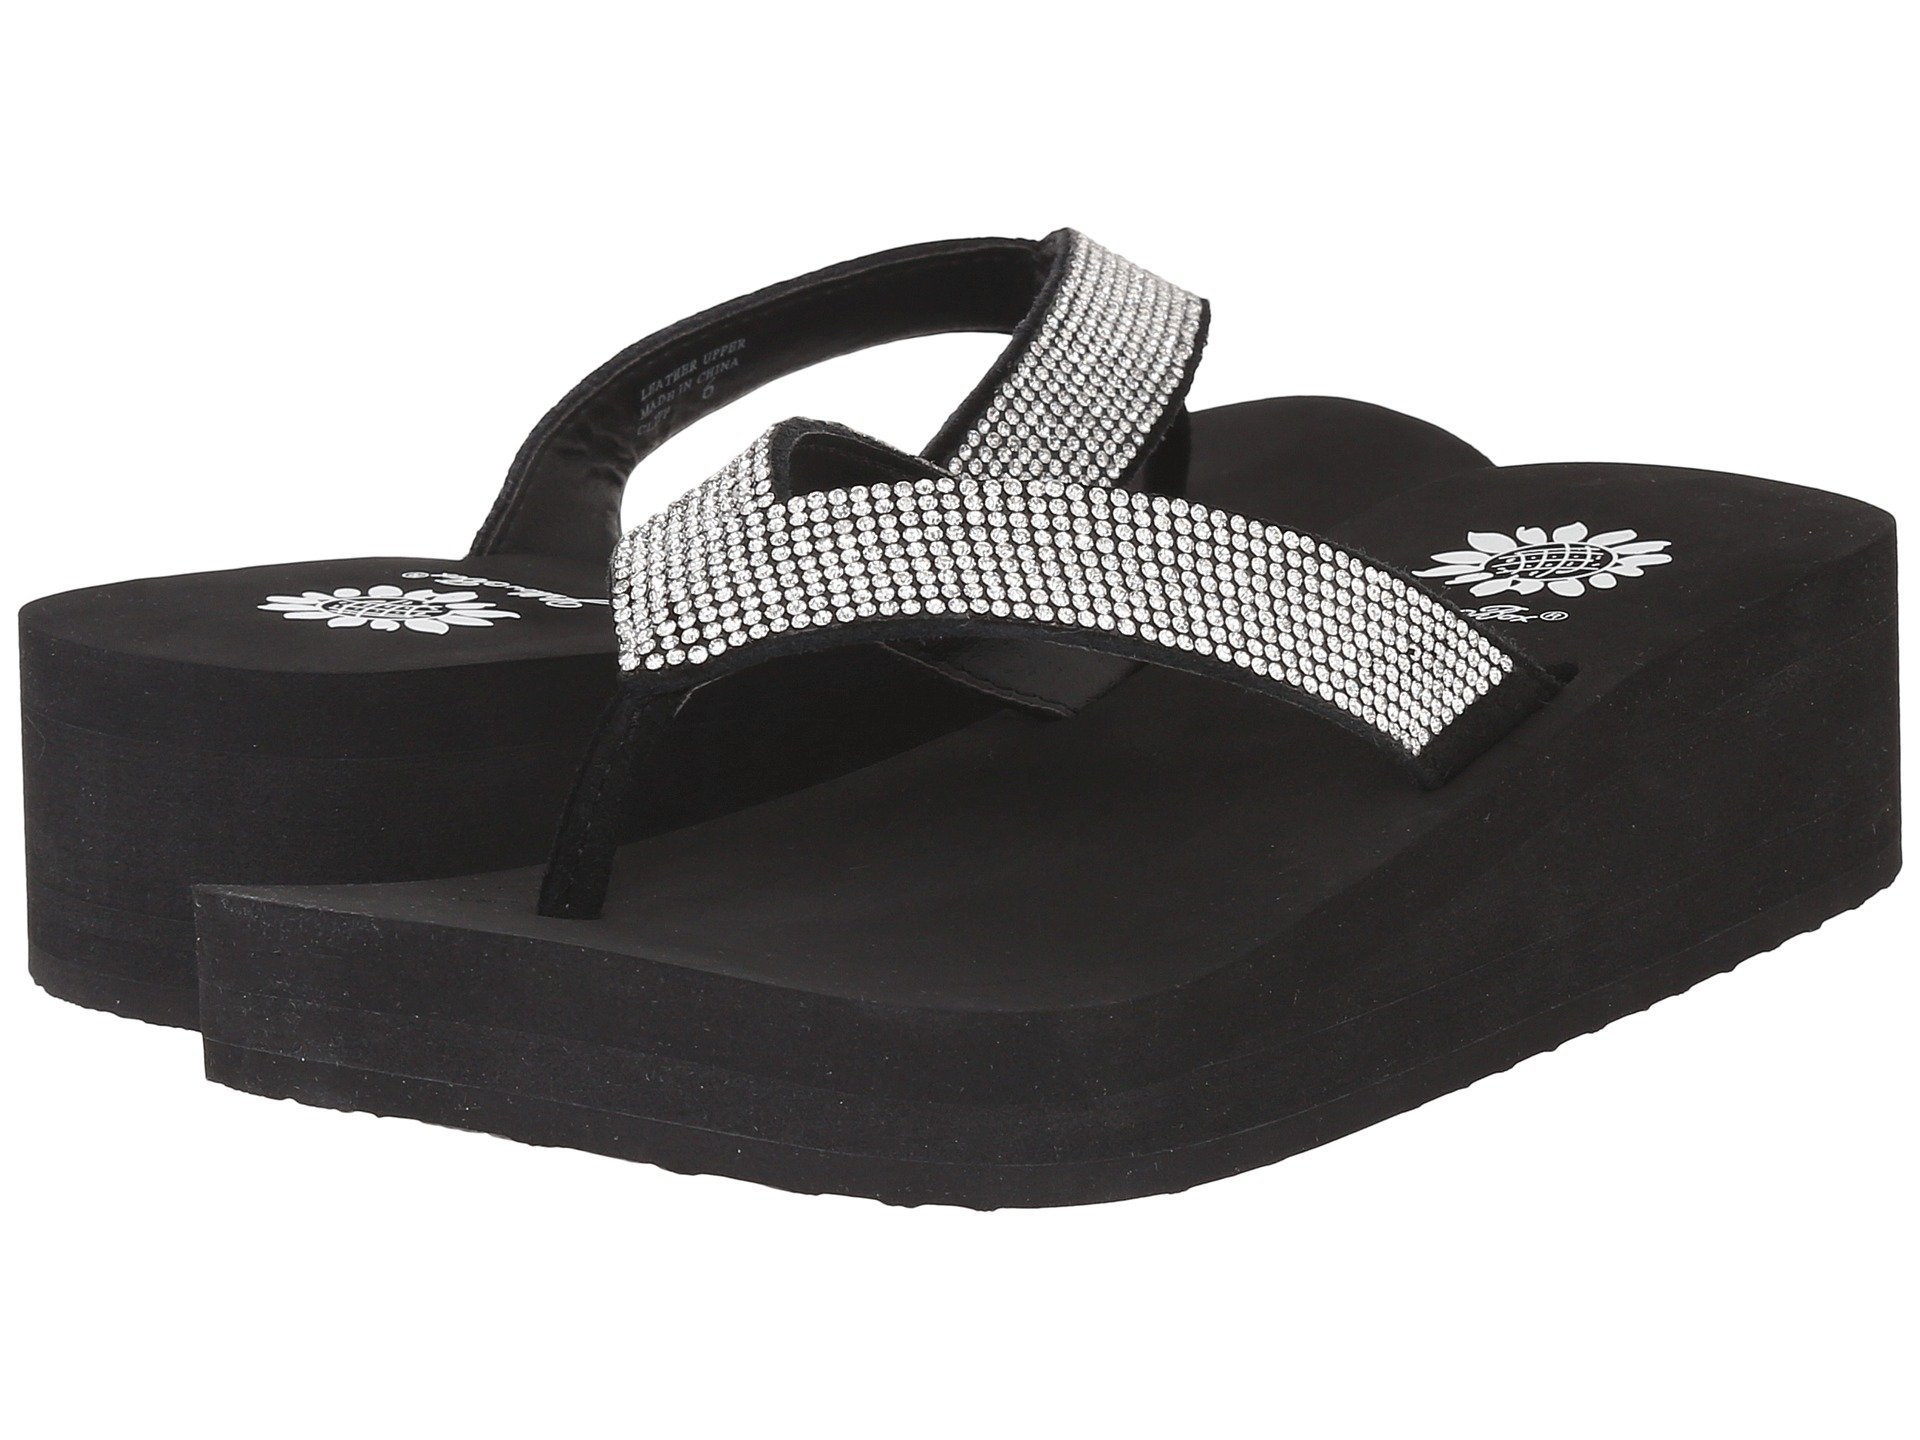 c013dad8f73f20 Women s Yellow Box Sandals + FREE SHIPPING